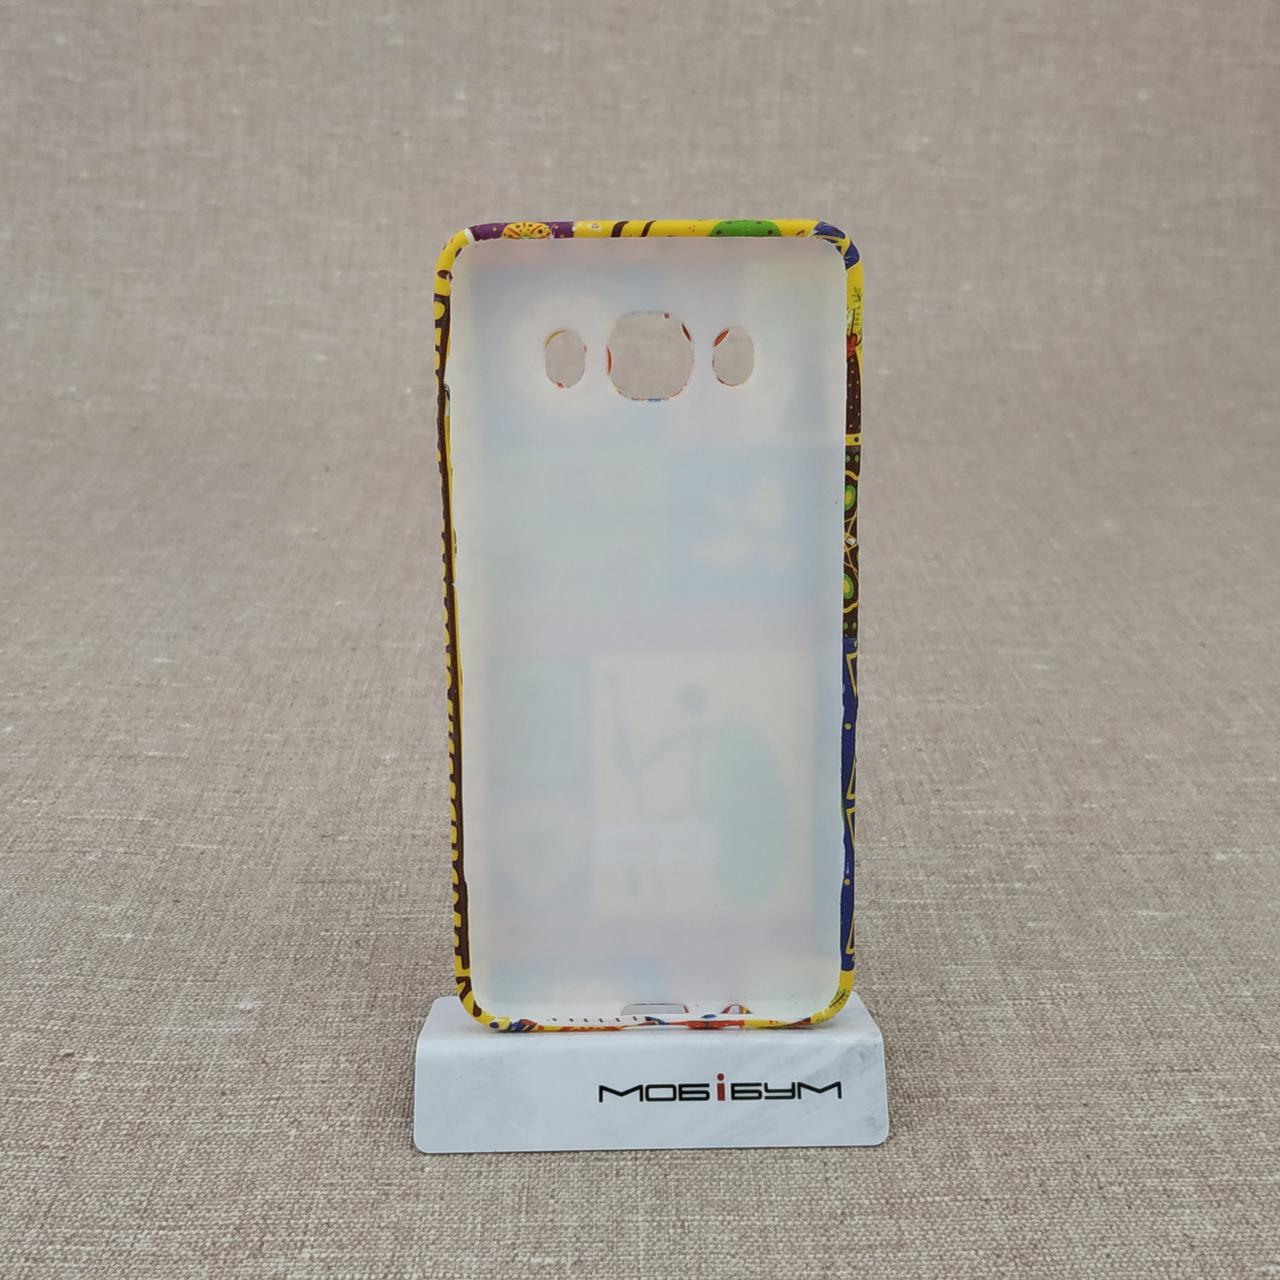 TPU светящийся Samsung Galaxy J510 J5 (J530) 2017 Для телефона